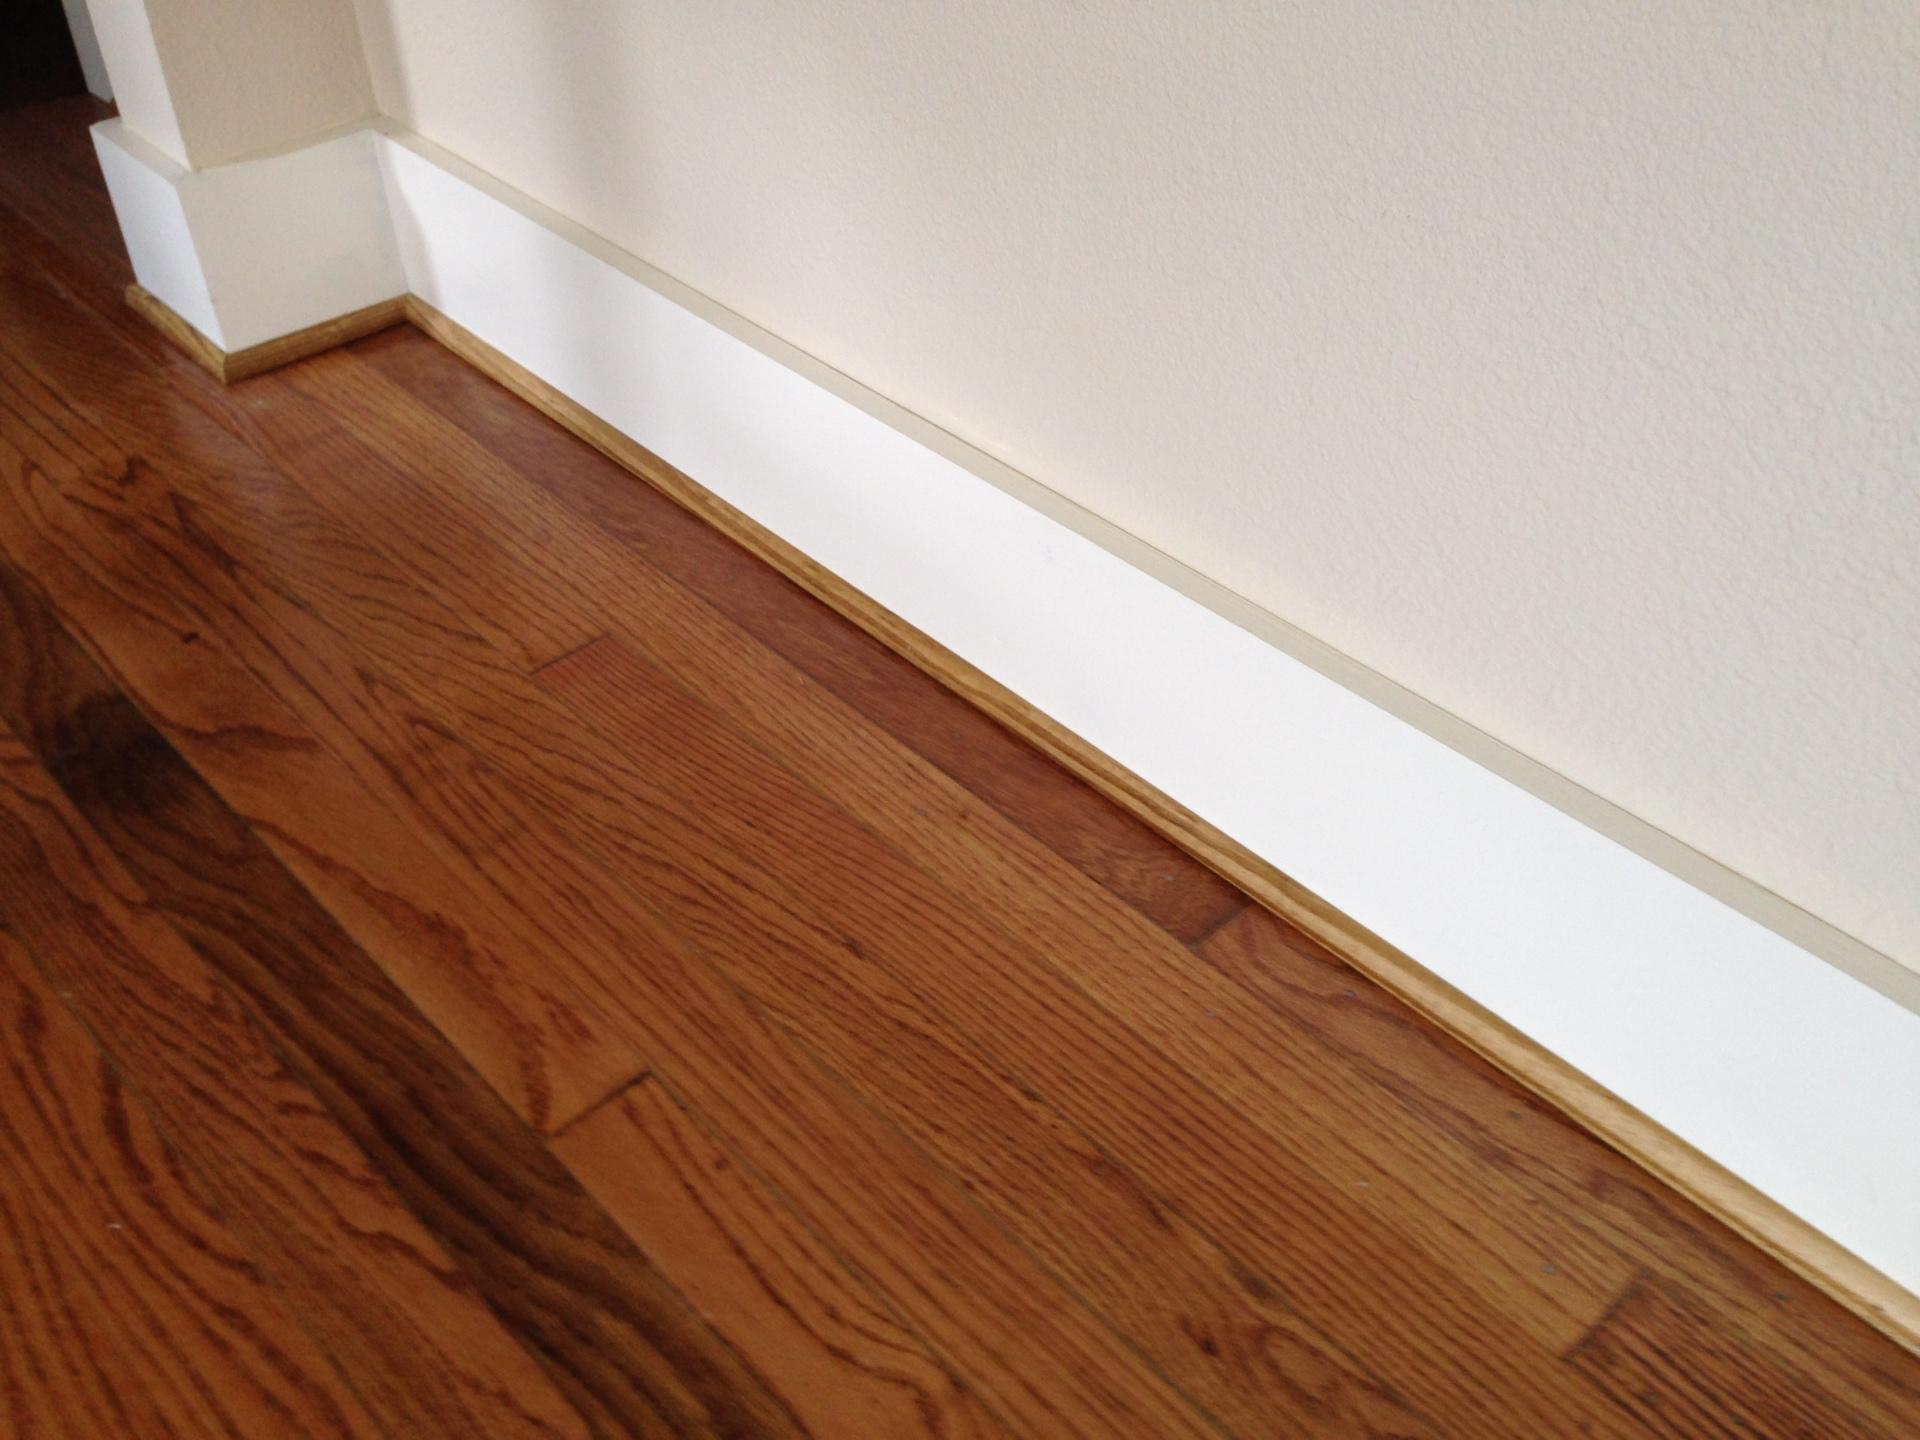 Hardwood Flooring Install & Repair